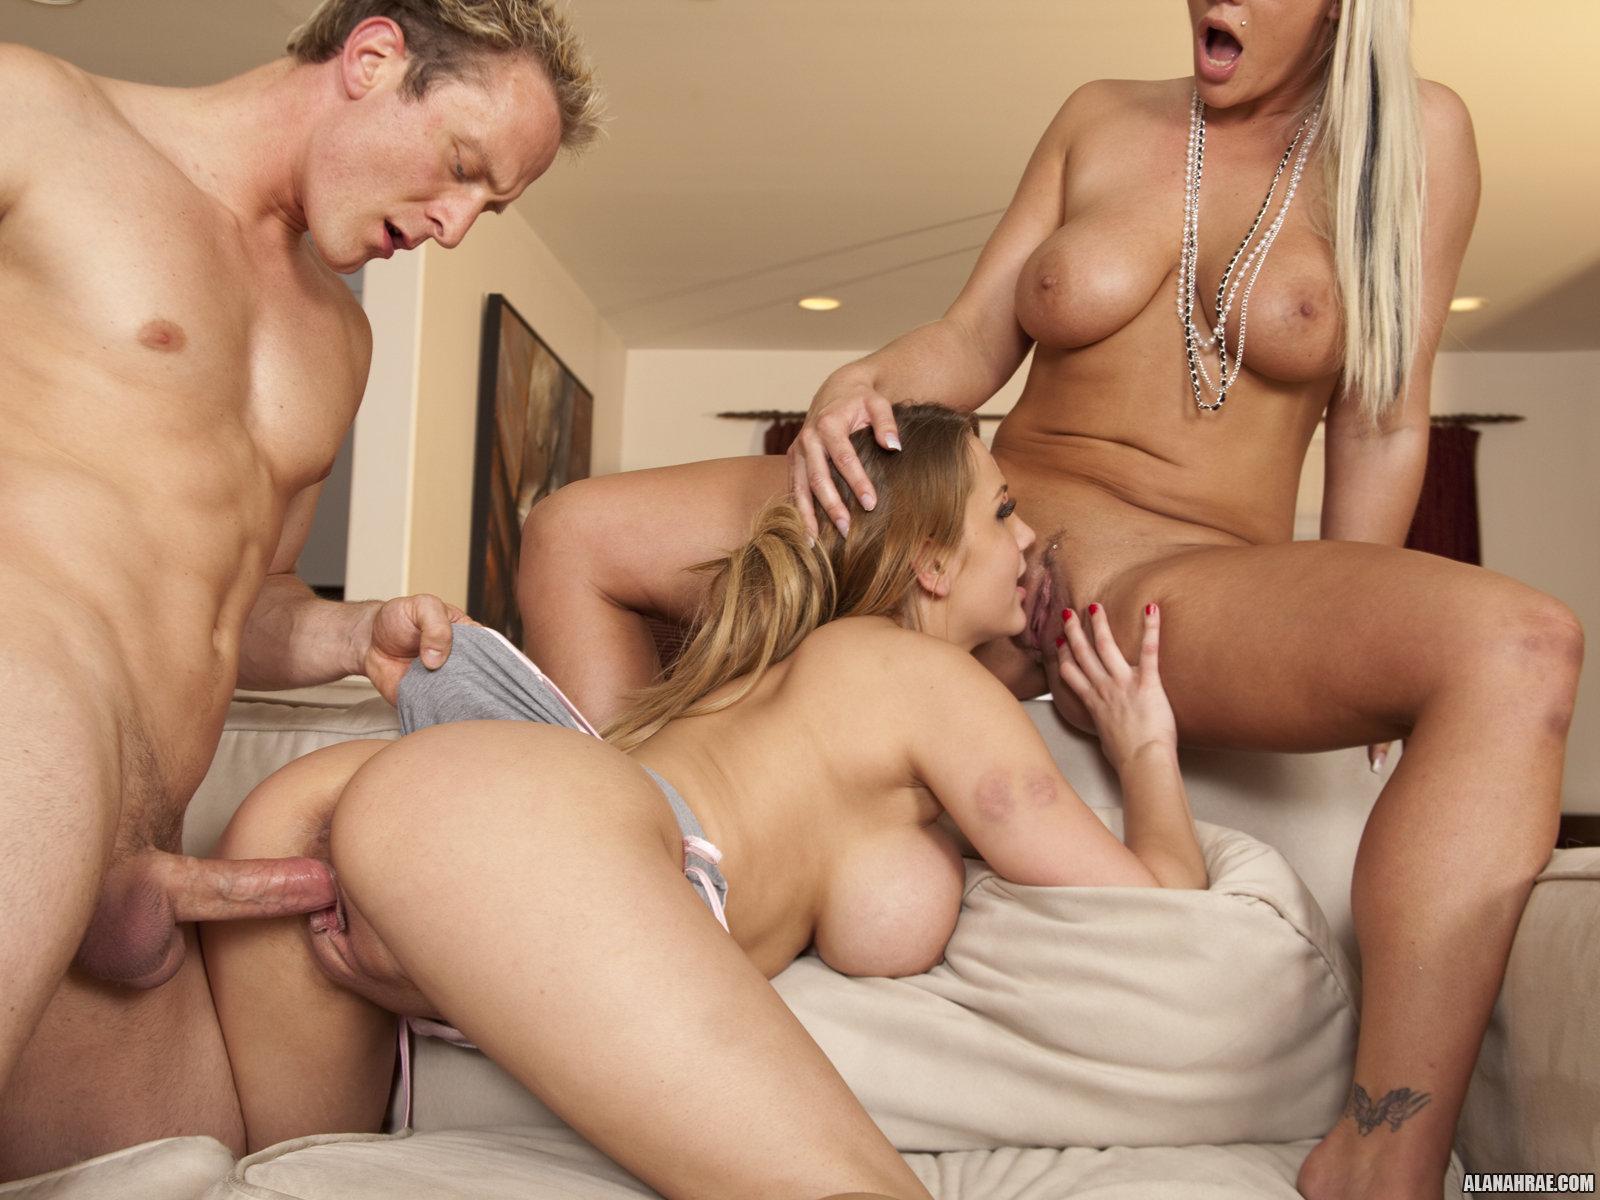 Alanah rae threesome